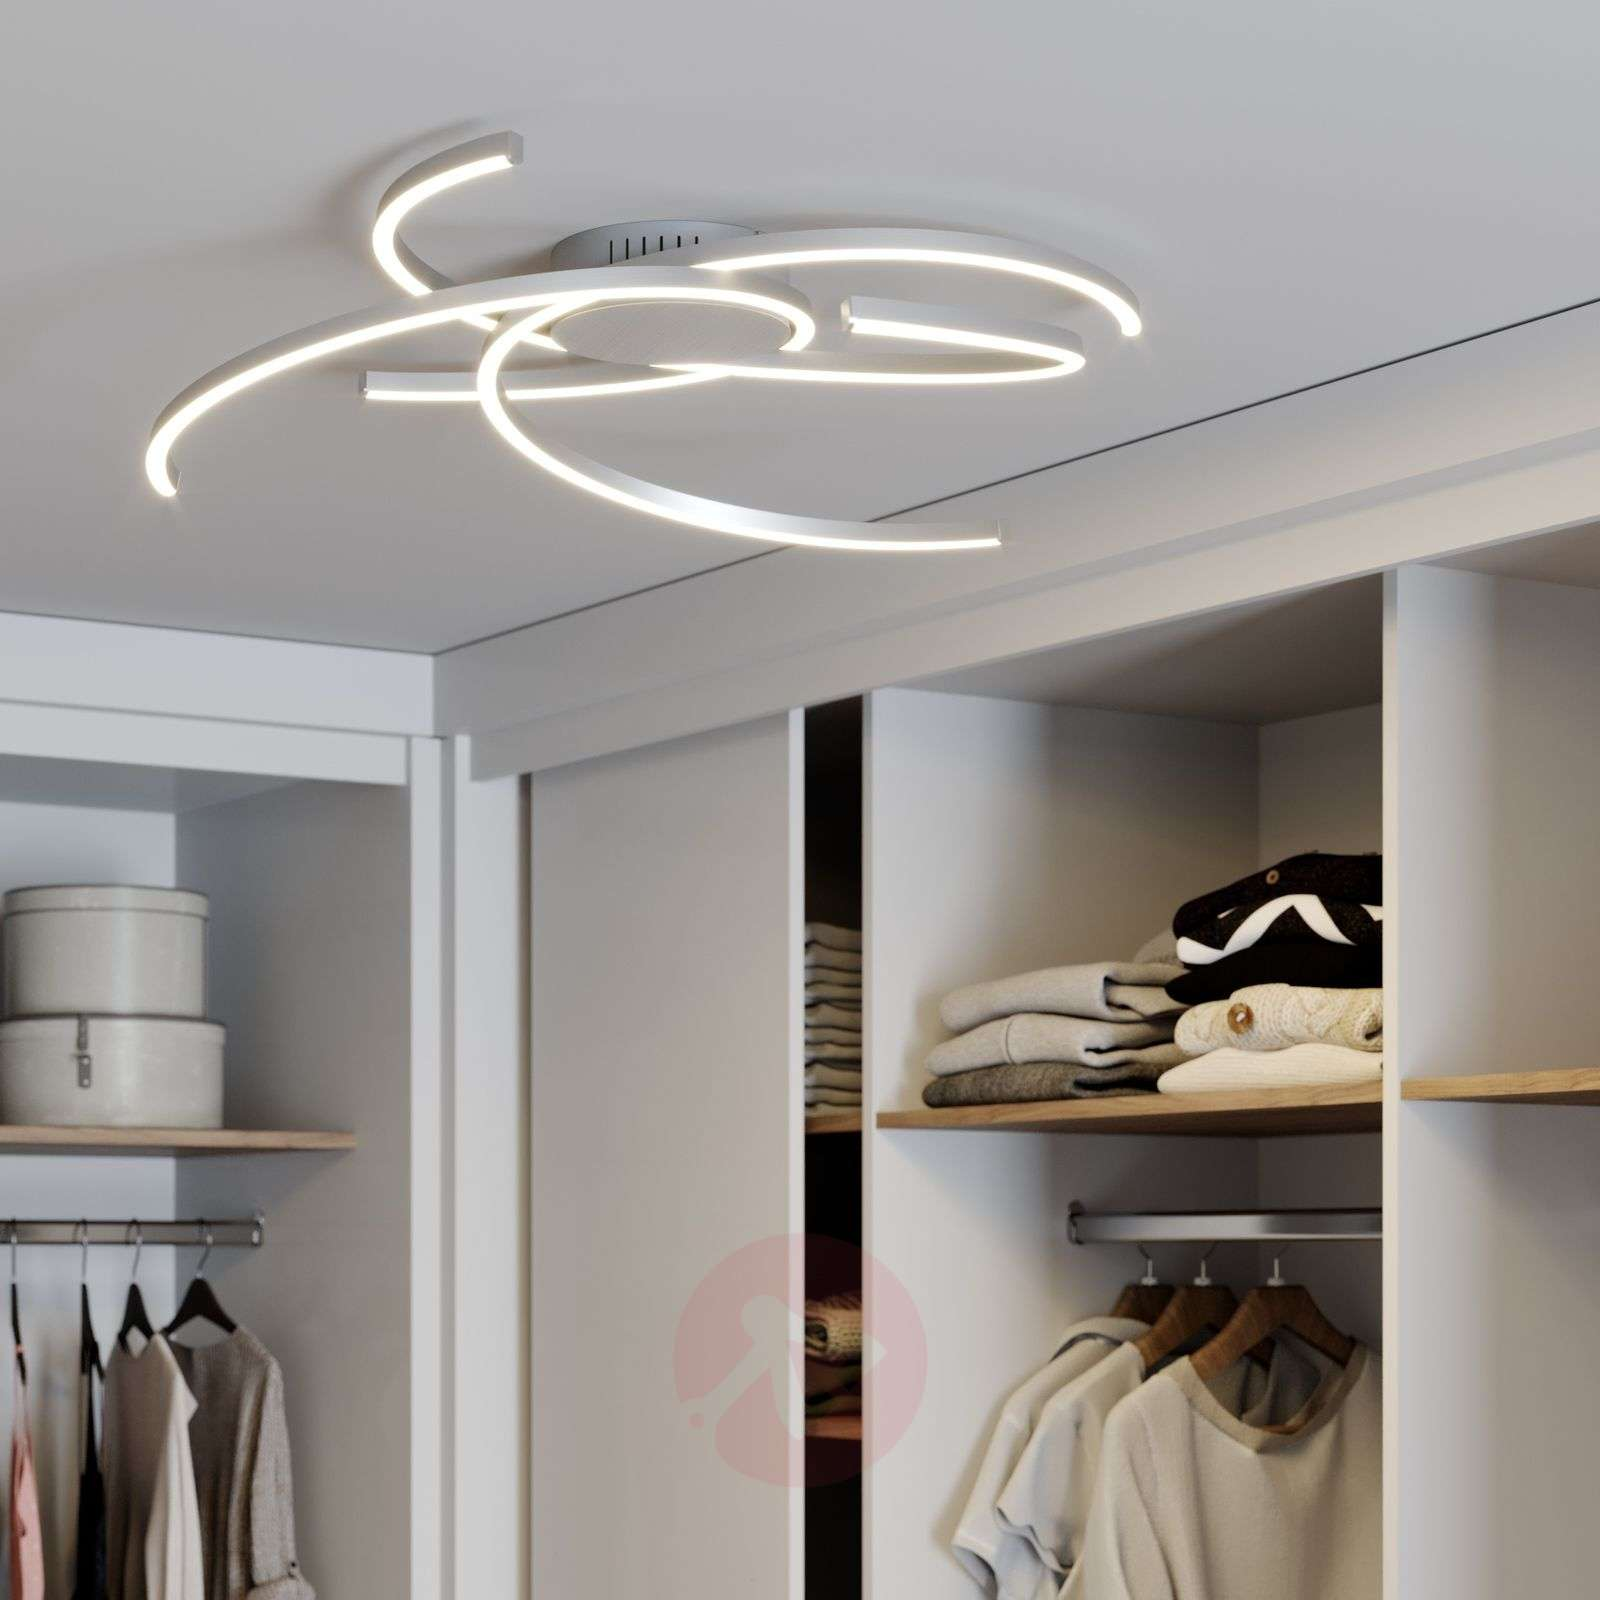 Lindby Katris LED-kattovalaisin, 73 cm, alumiini-9639151-02